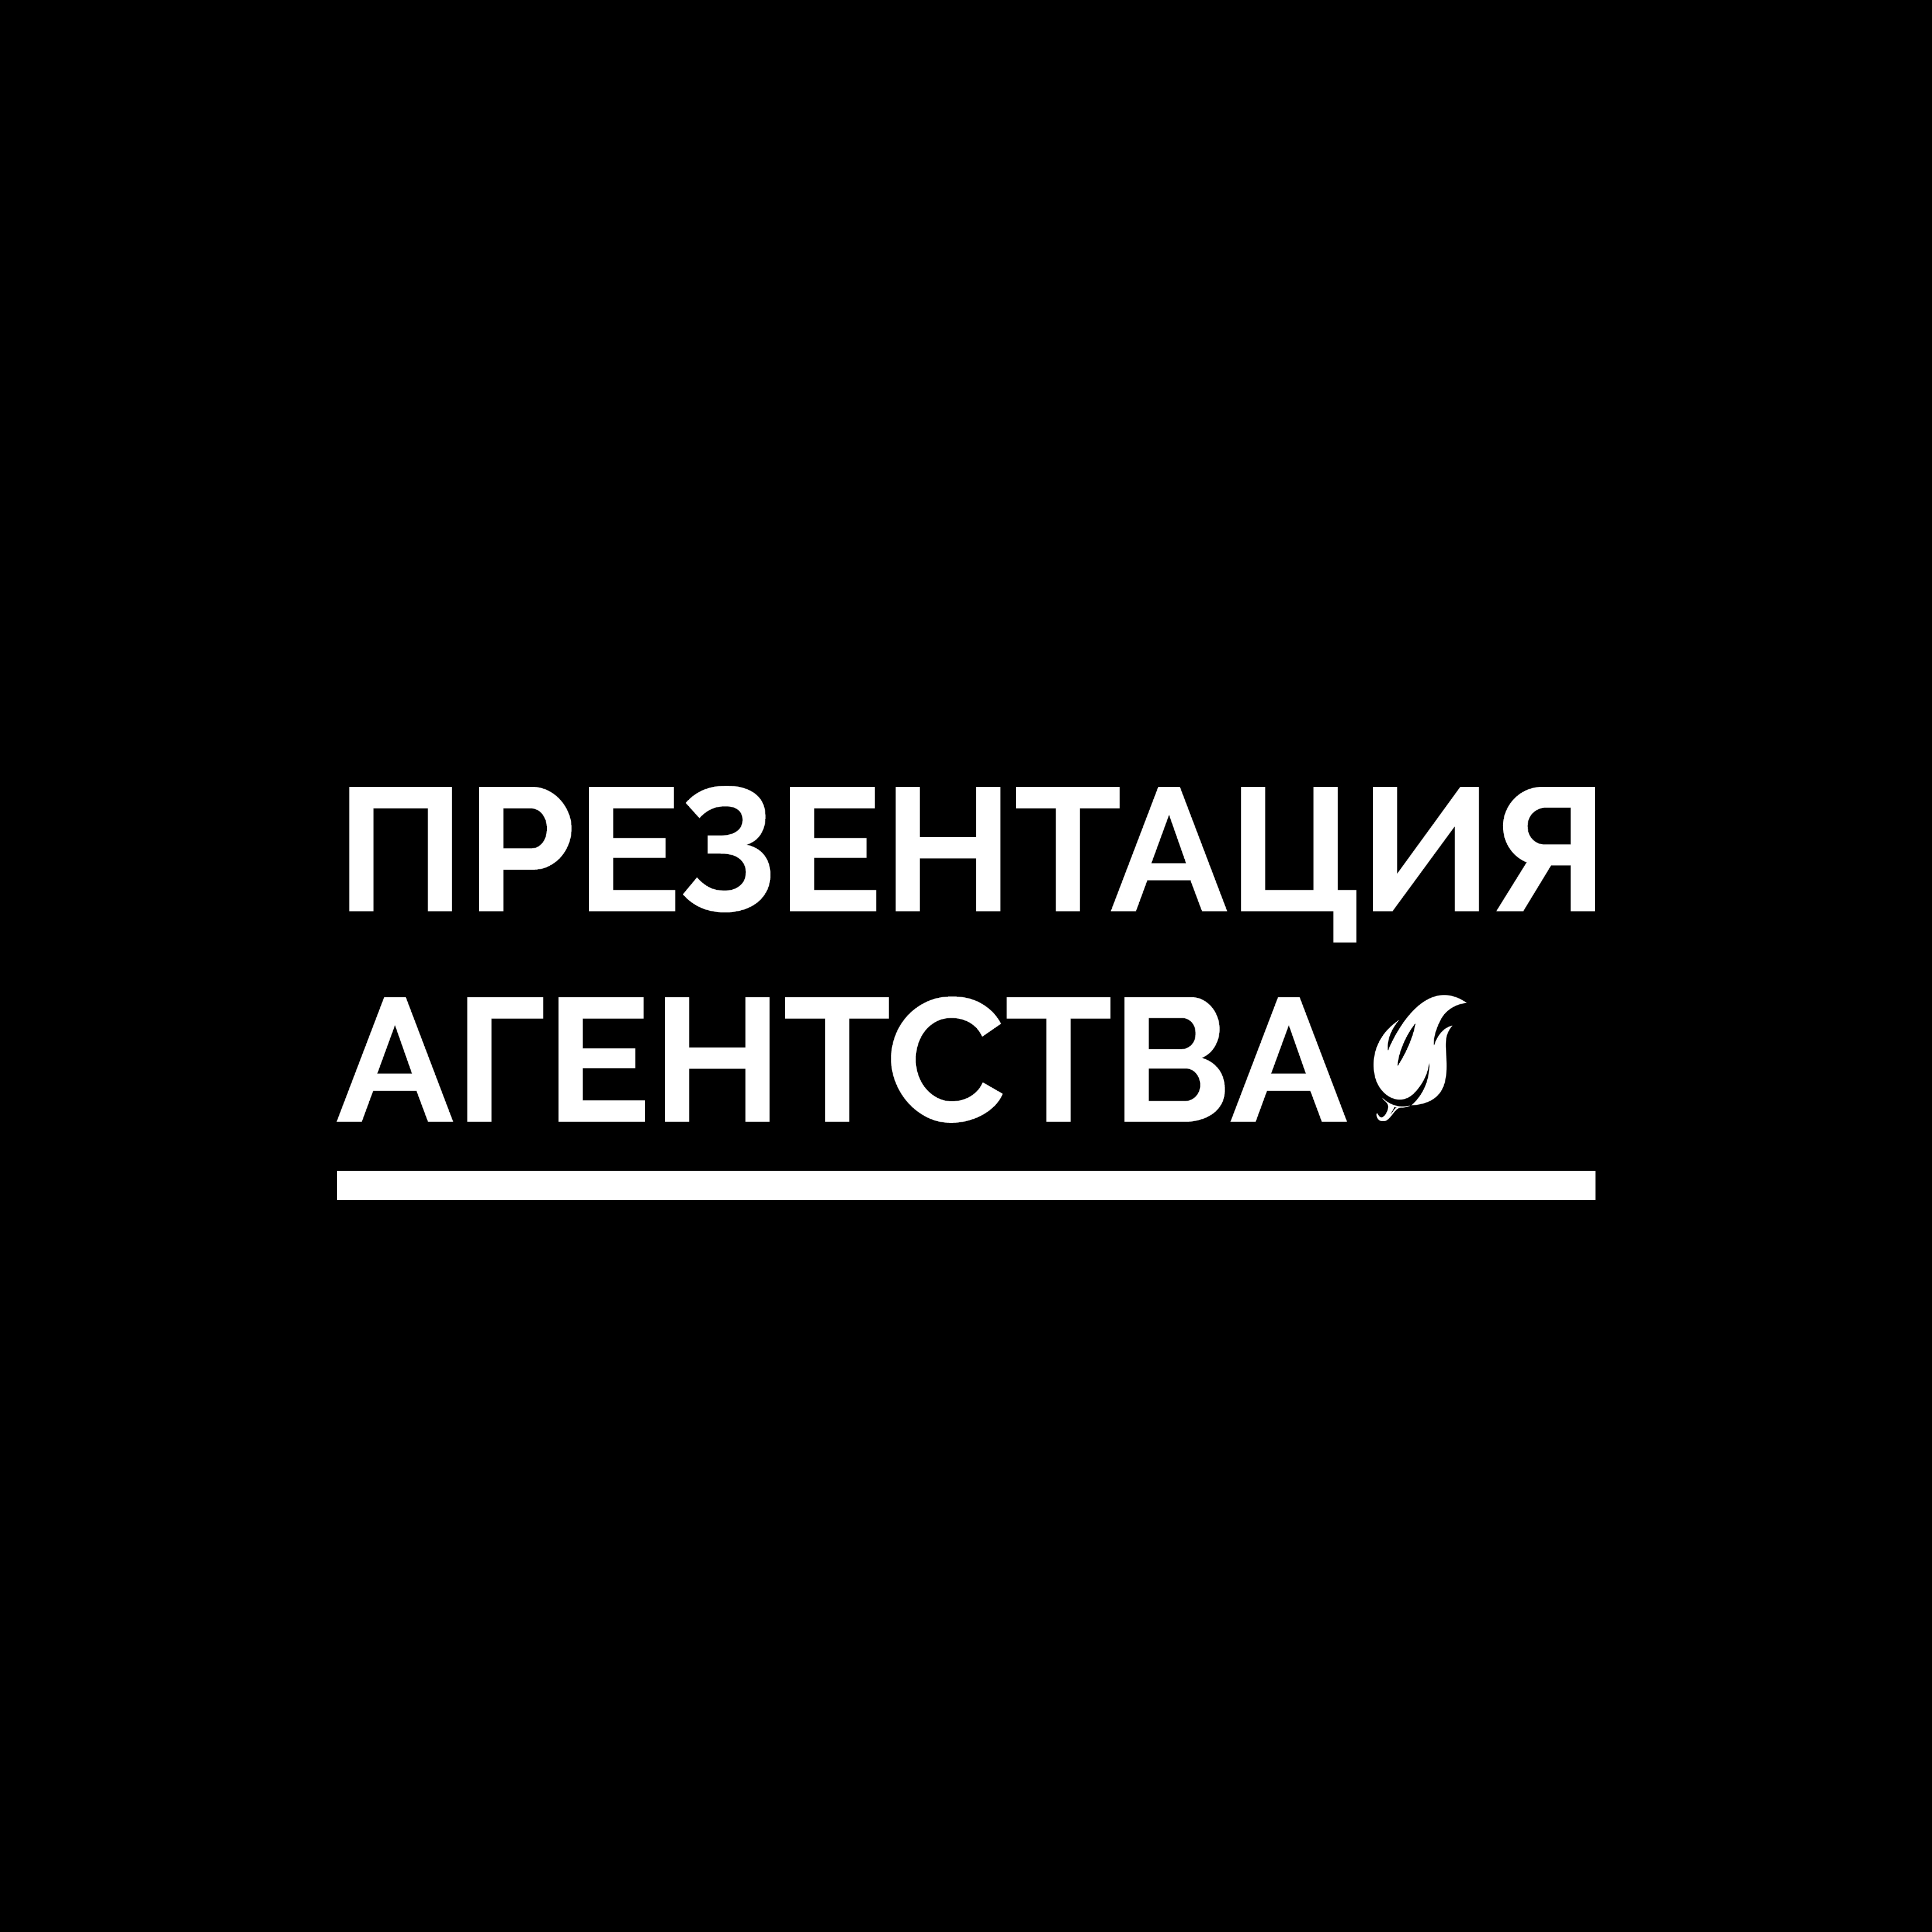 НАС ЕЩЁ МНОГО